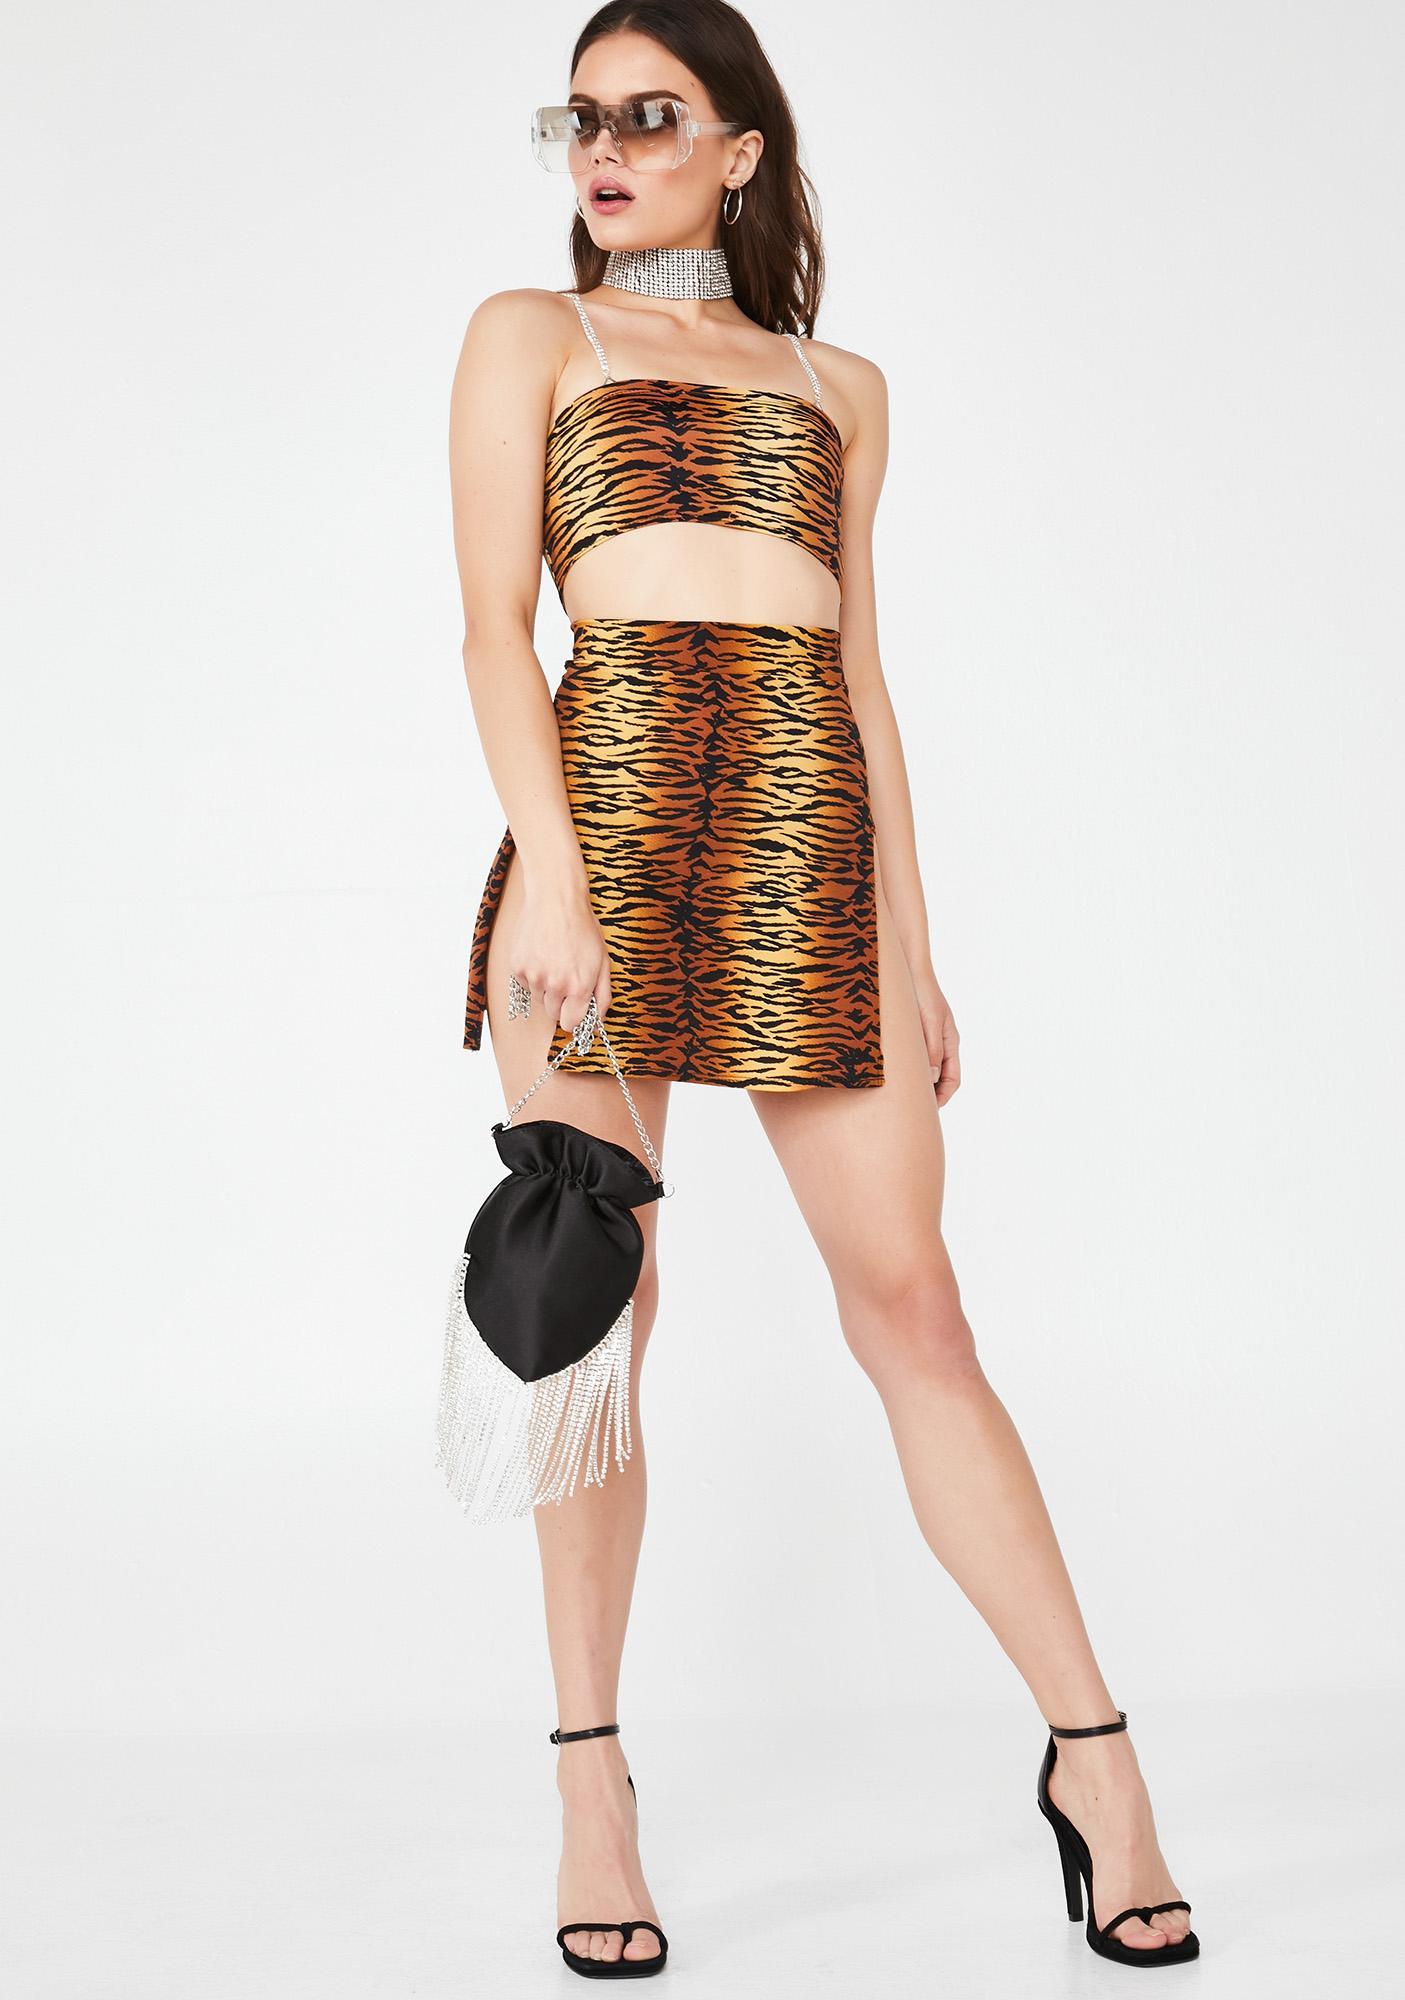 $A$$YPANT$ Roarin' Skirt Set